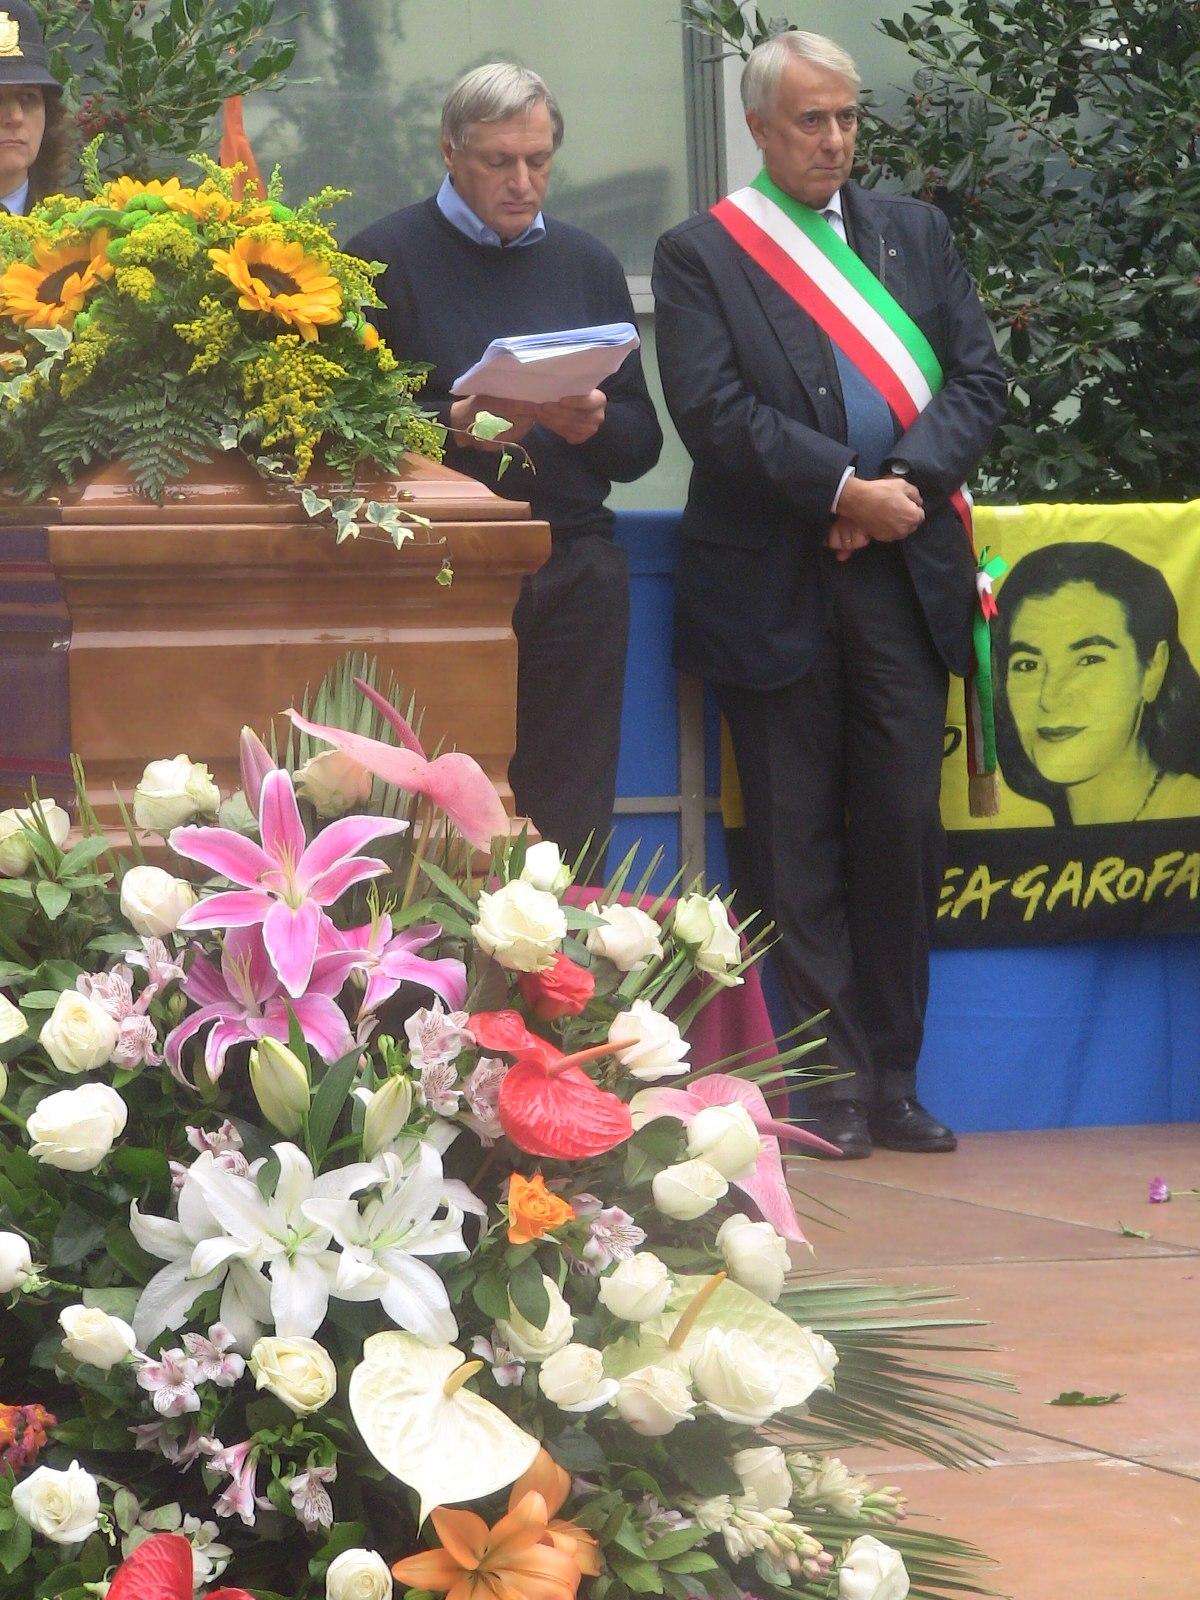 Pisapia ai funerali Lea Garofalo